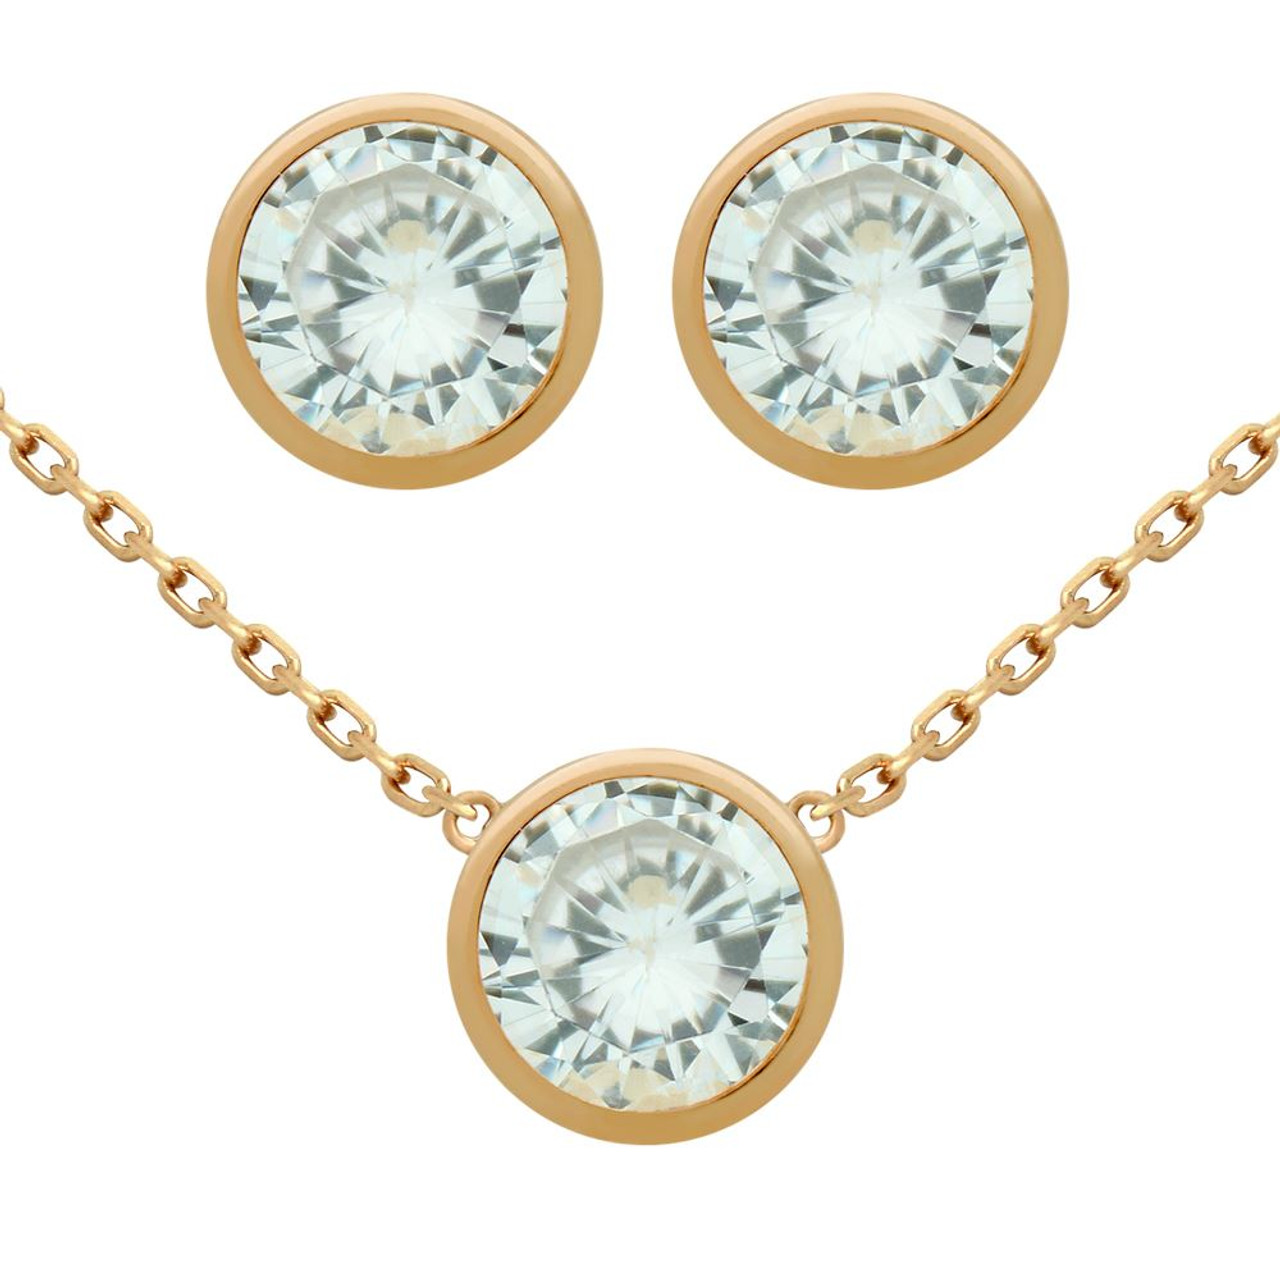 Sterling Silver or Rose Gold Plated Dangling Bezel-Set CZ 16+2 Necklace